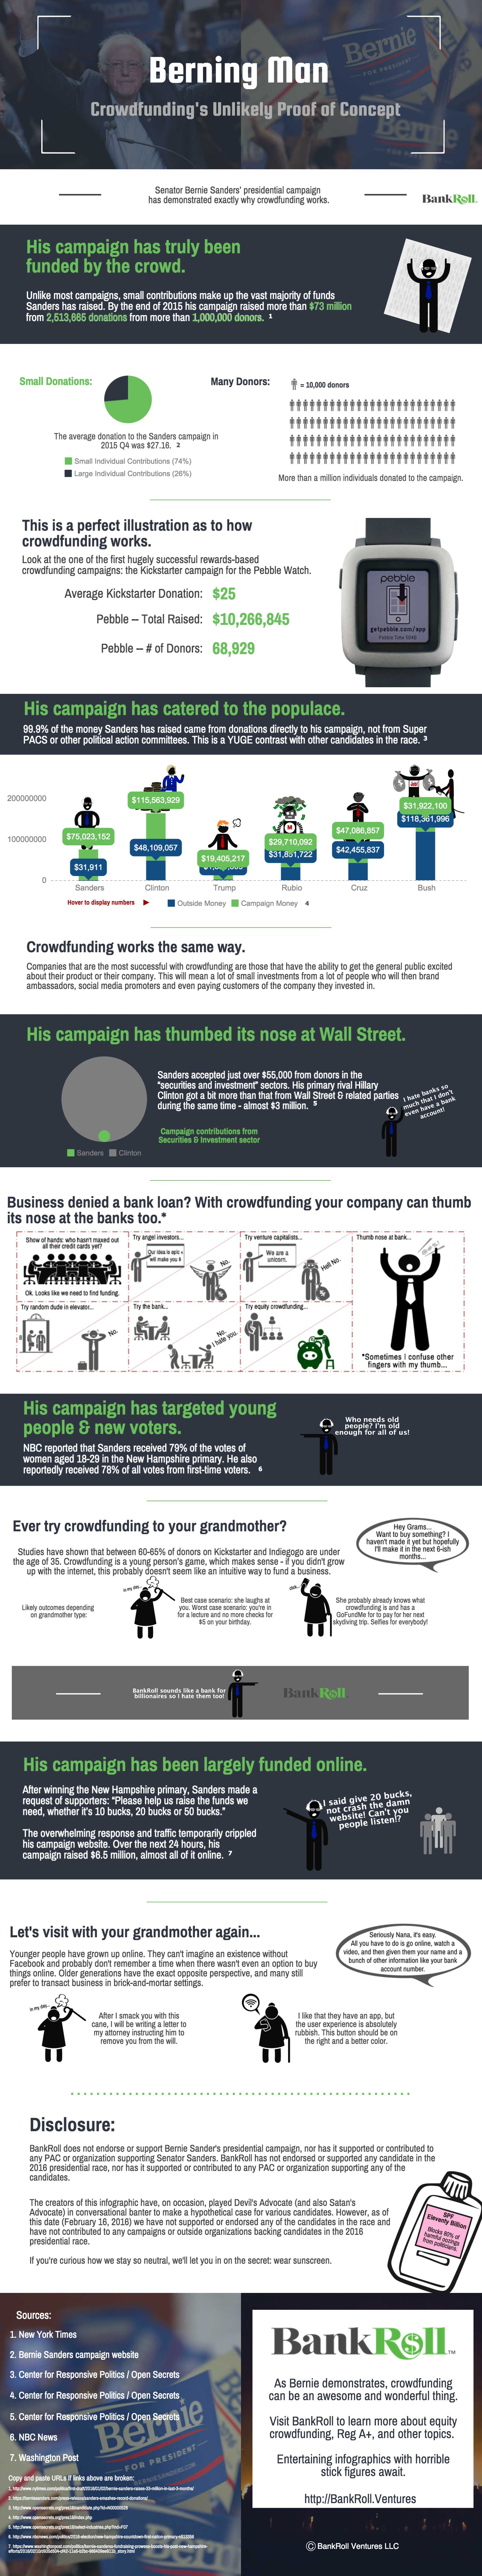 Berning Man - Bernie Sanders (Infographic)